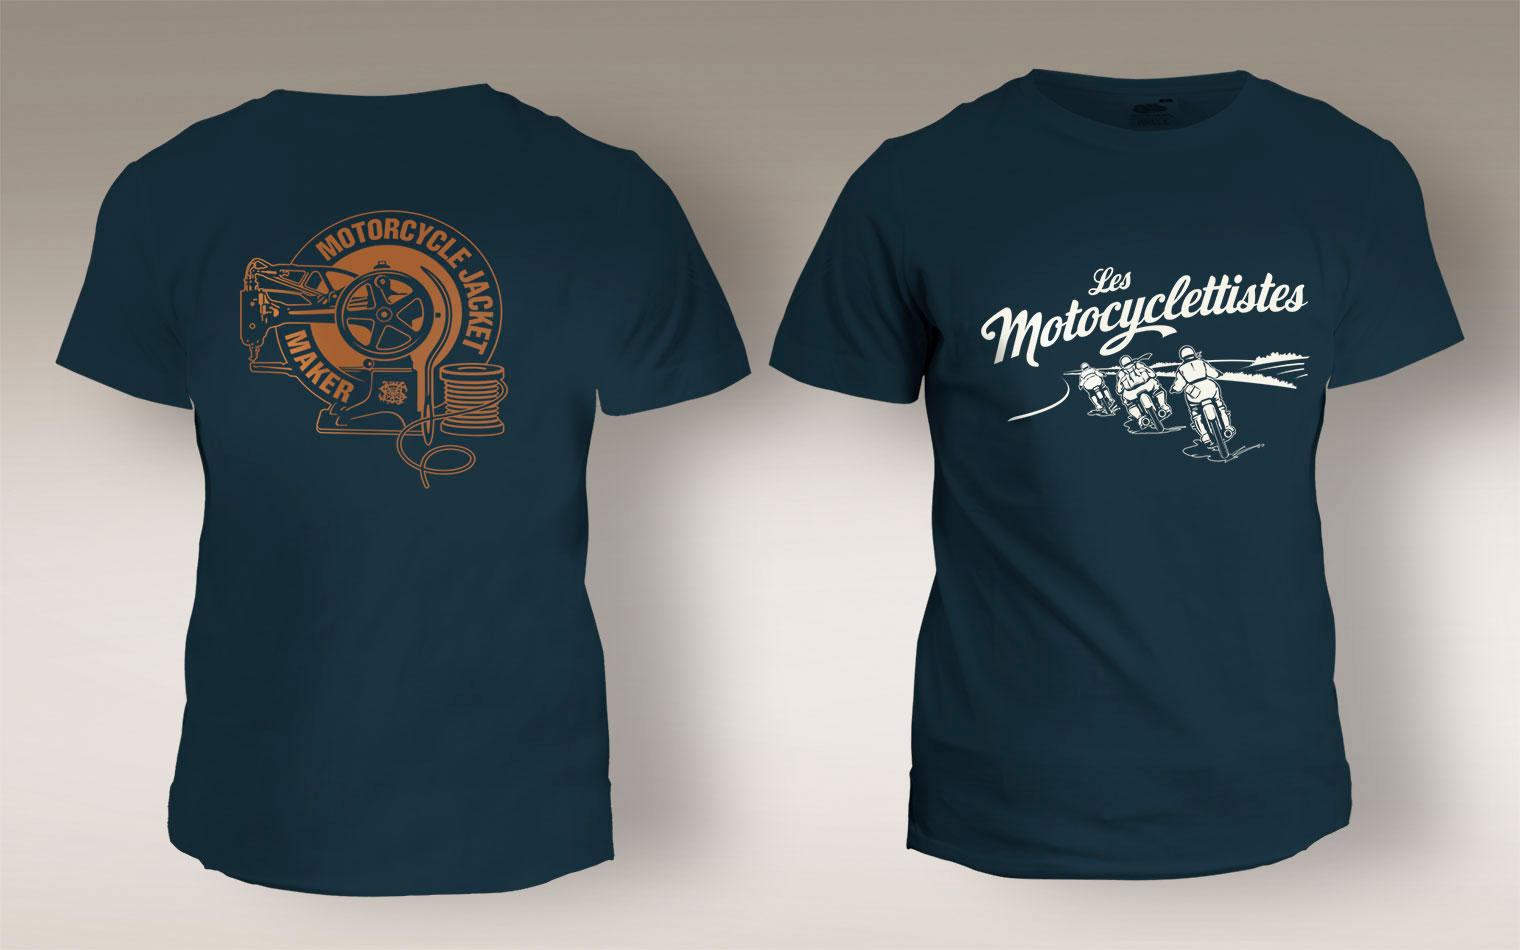 Tee-shirts Les Motocyclettistes par Maindor